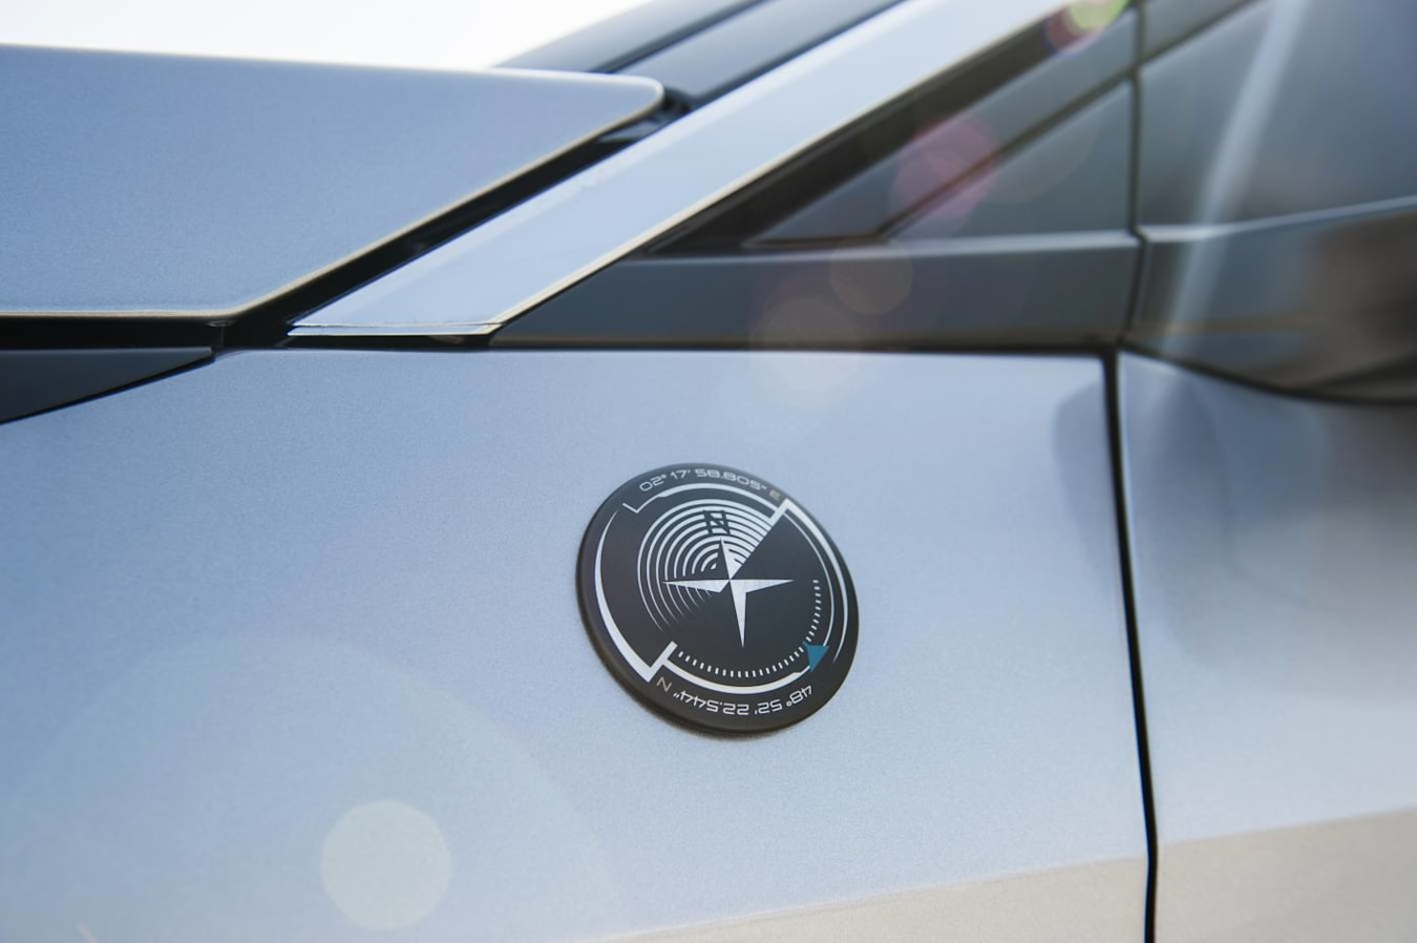 Peugeot crossway badge